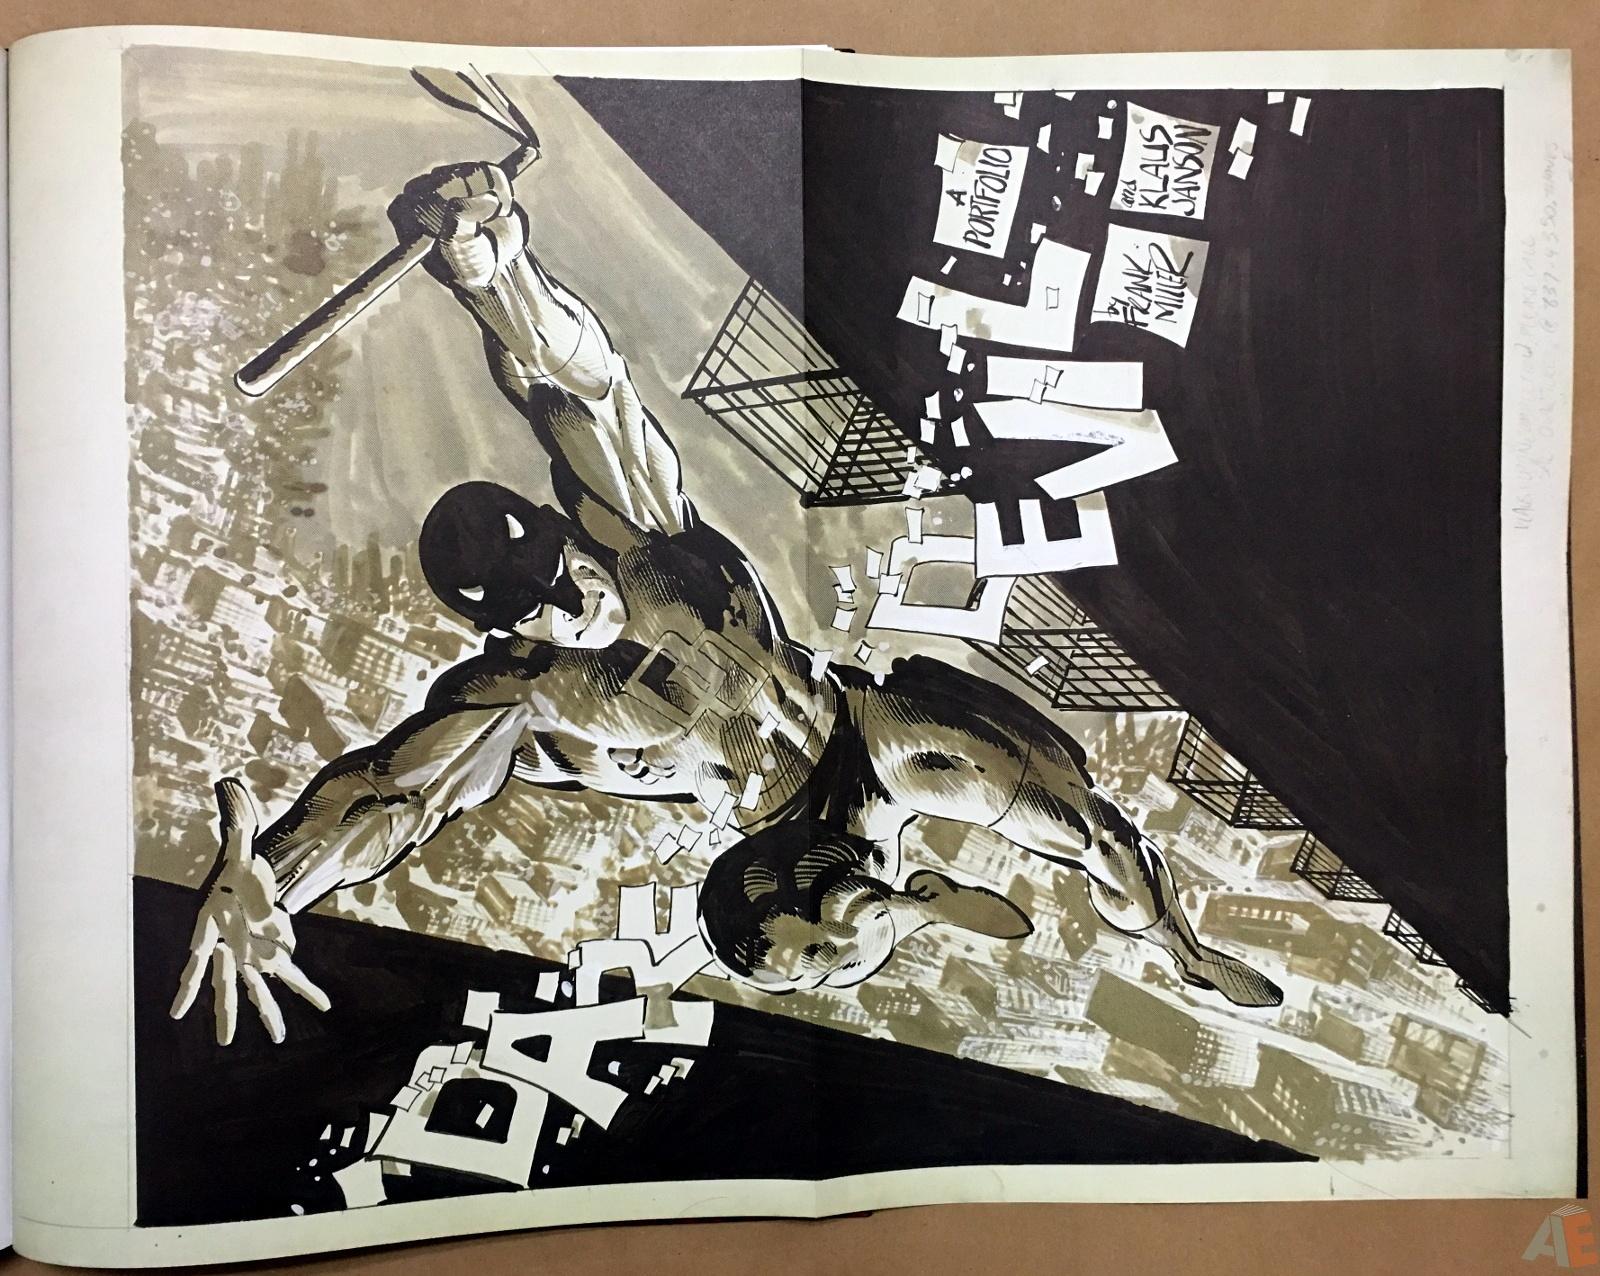 Frank Miller's Daredevil Artifact Edition 29